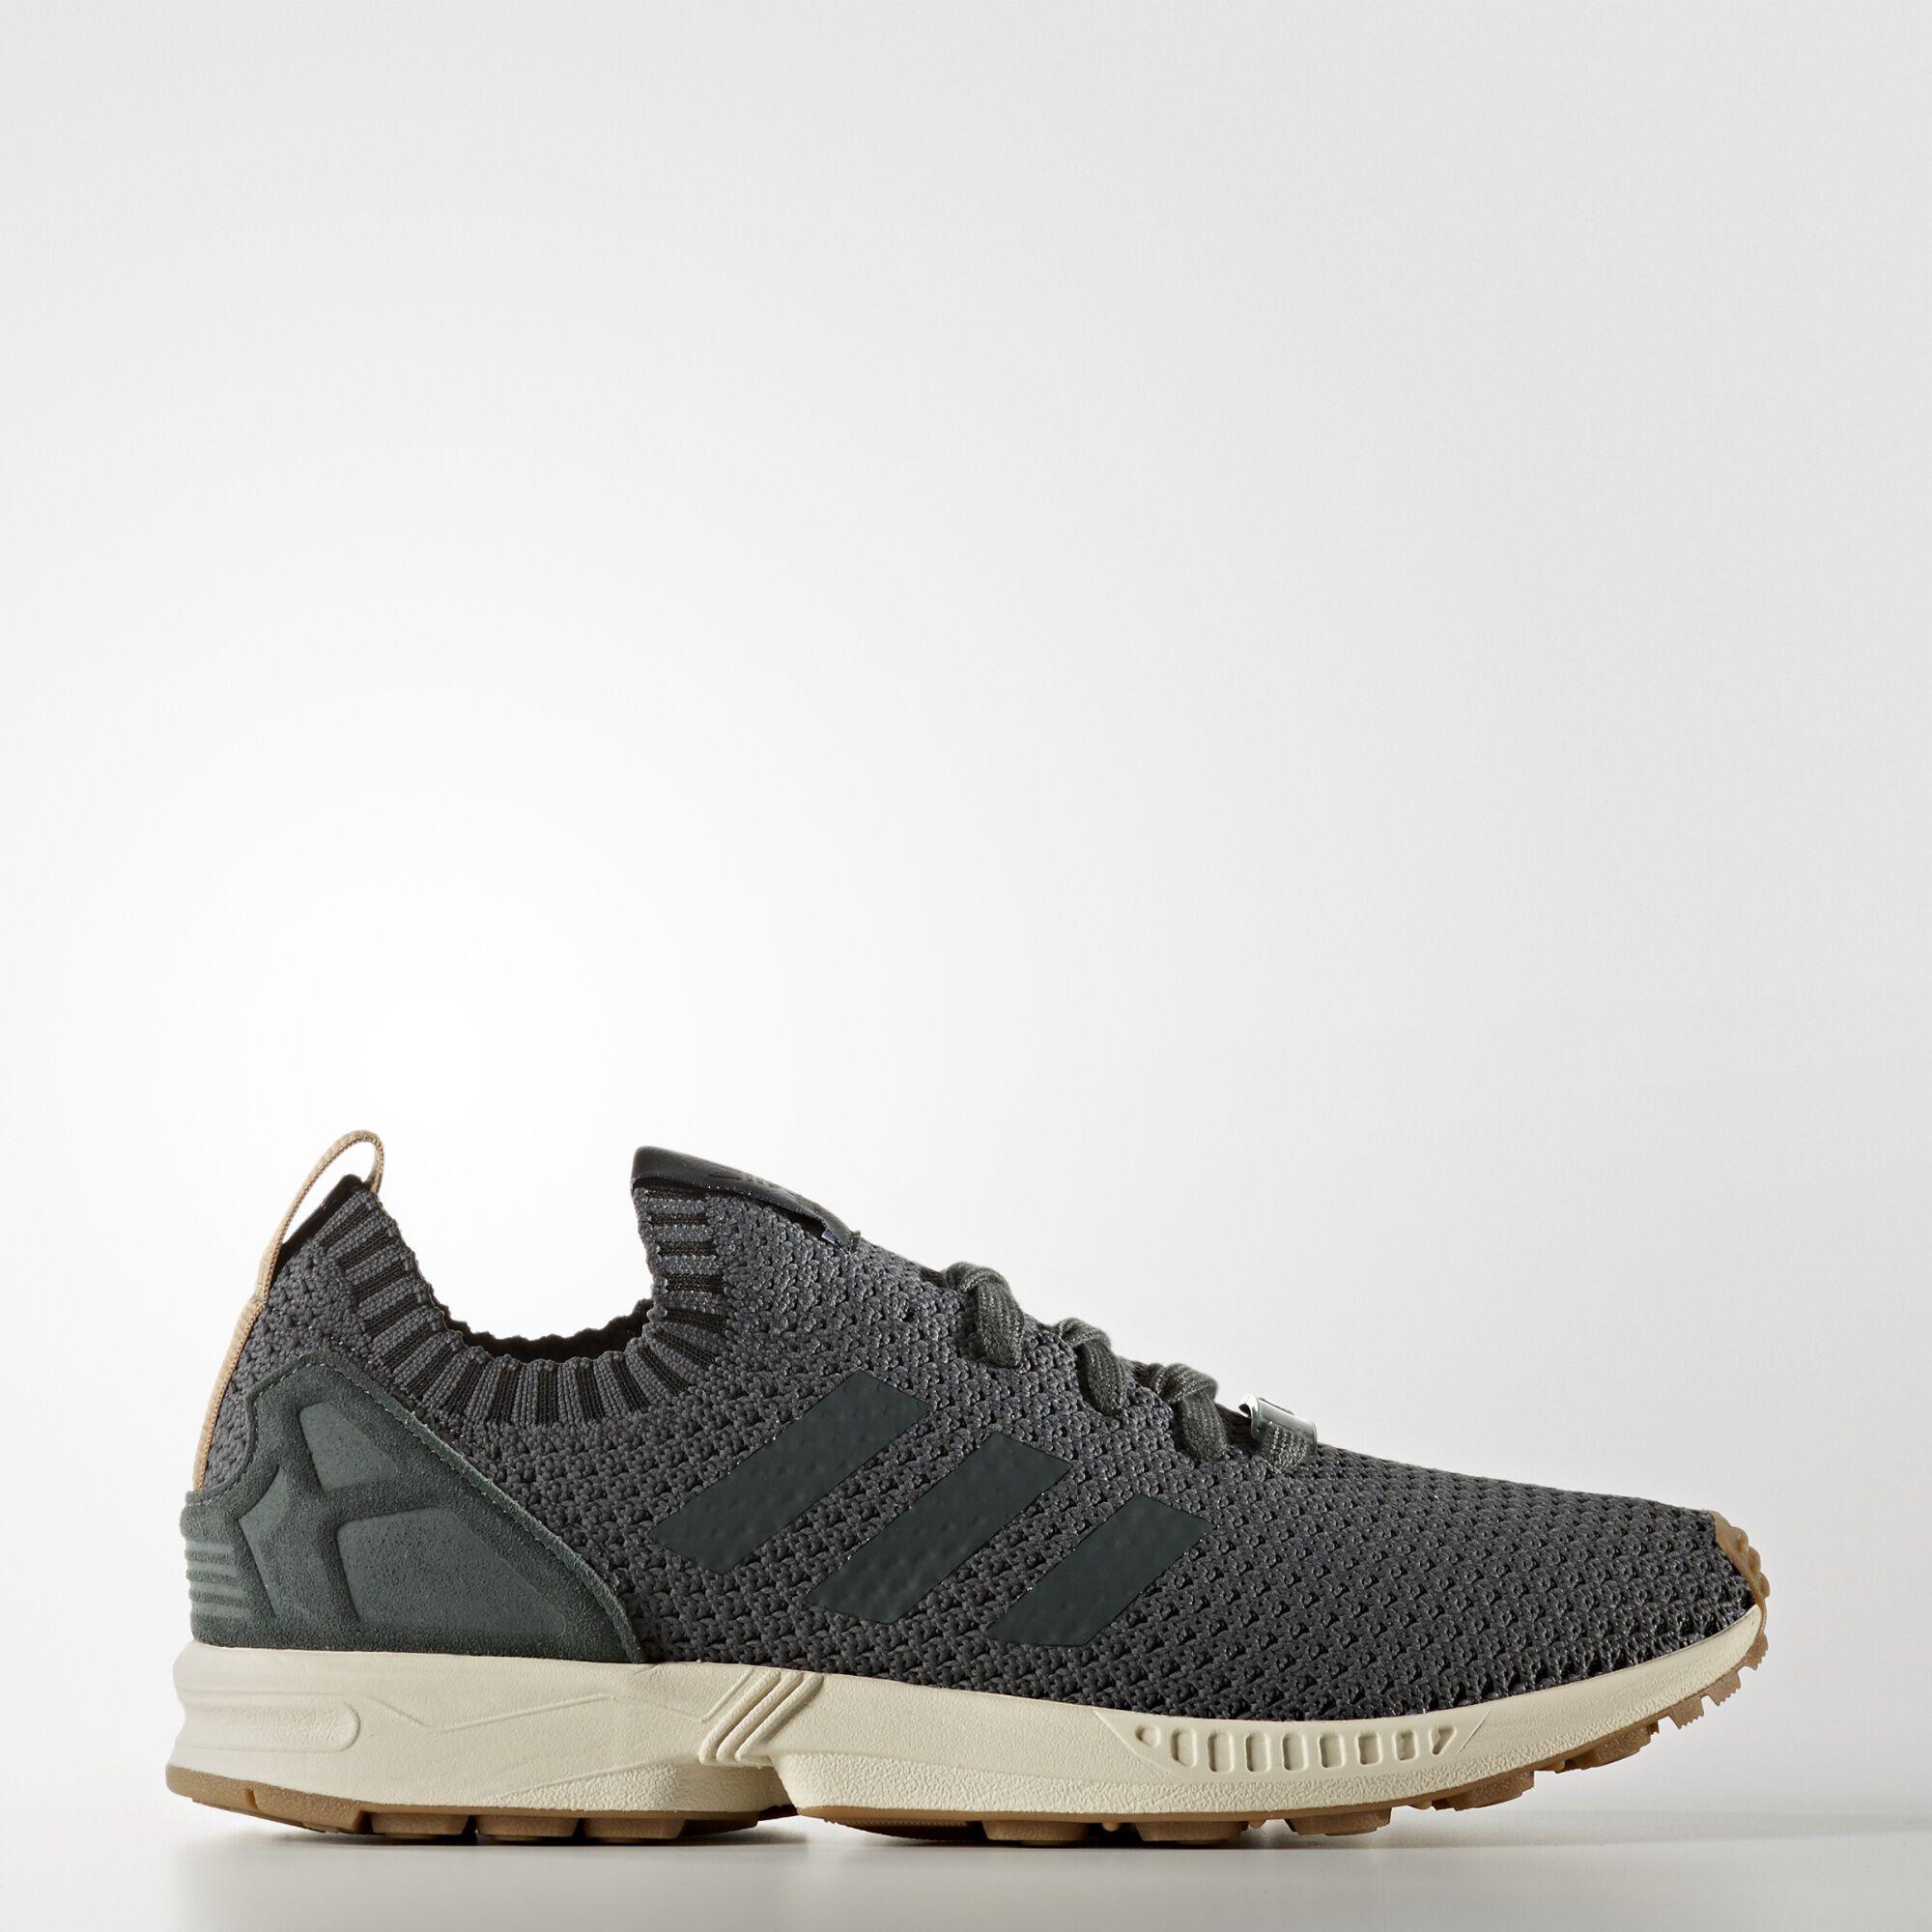 adidas Originals ZX FLUX WINTER CORE BLACK/CORE BLACK/VIN